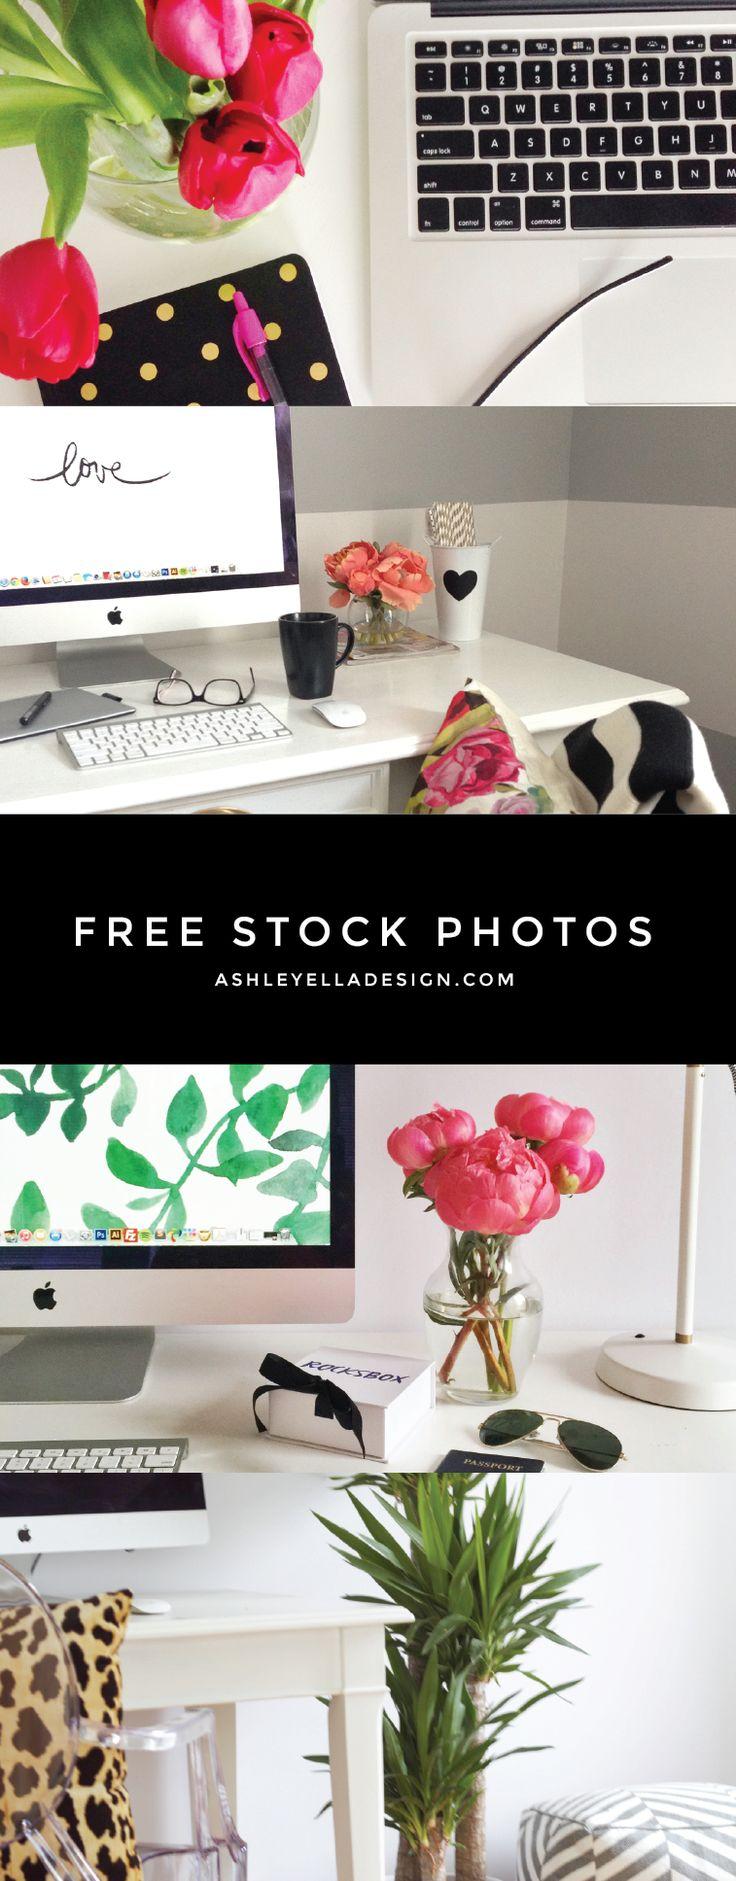 Free Stock Photos from Ashley Ella Design